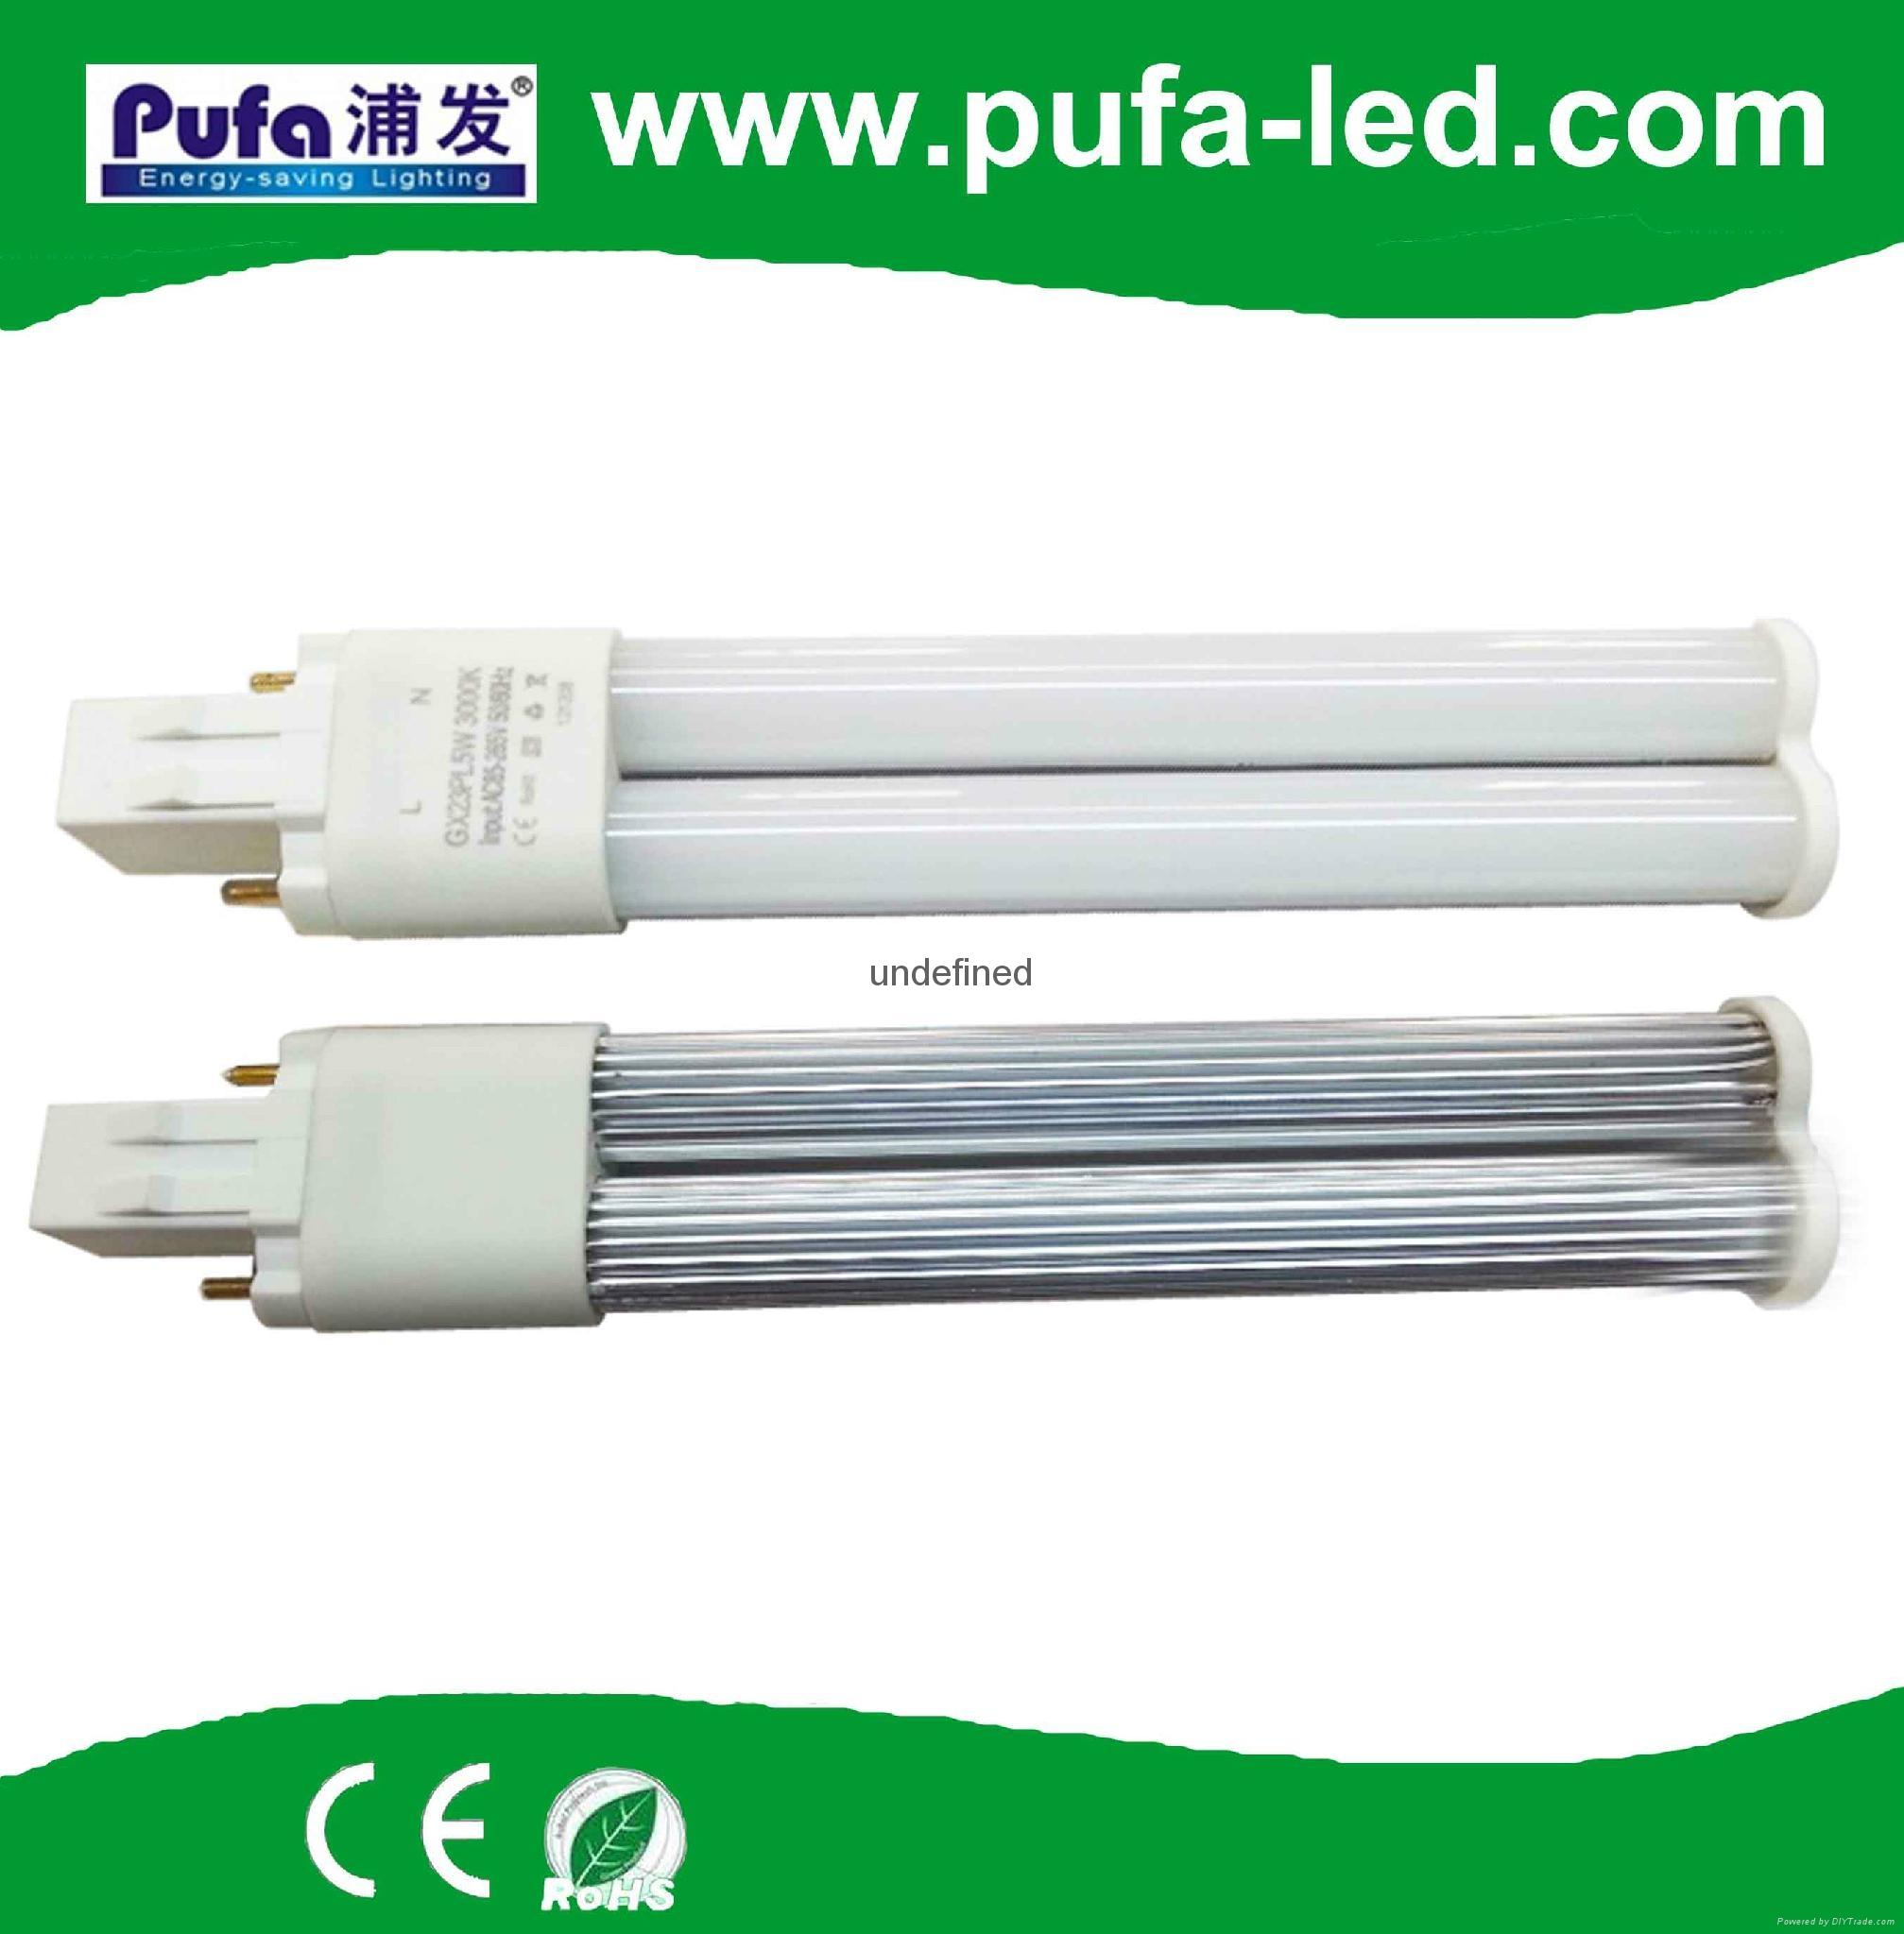 GX23 LED 横插灯 12W  1